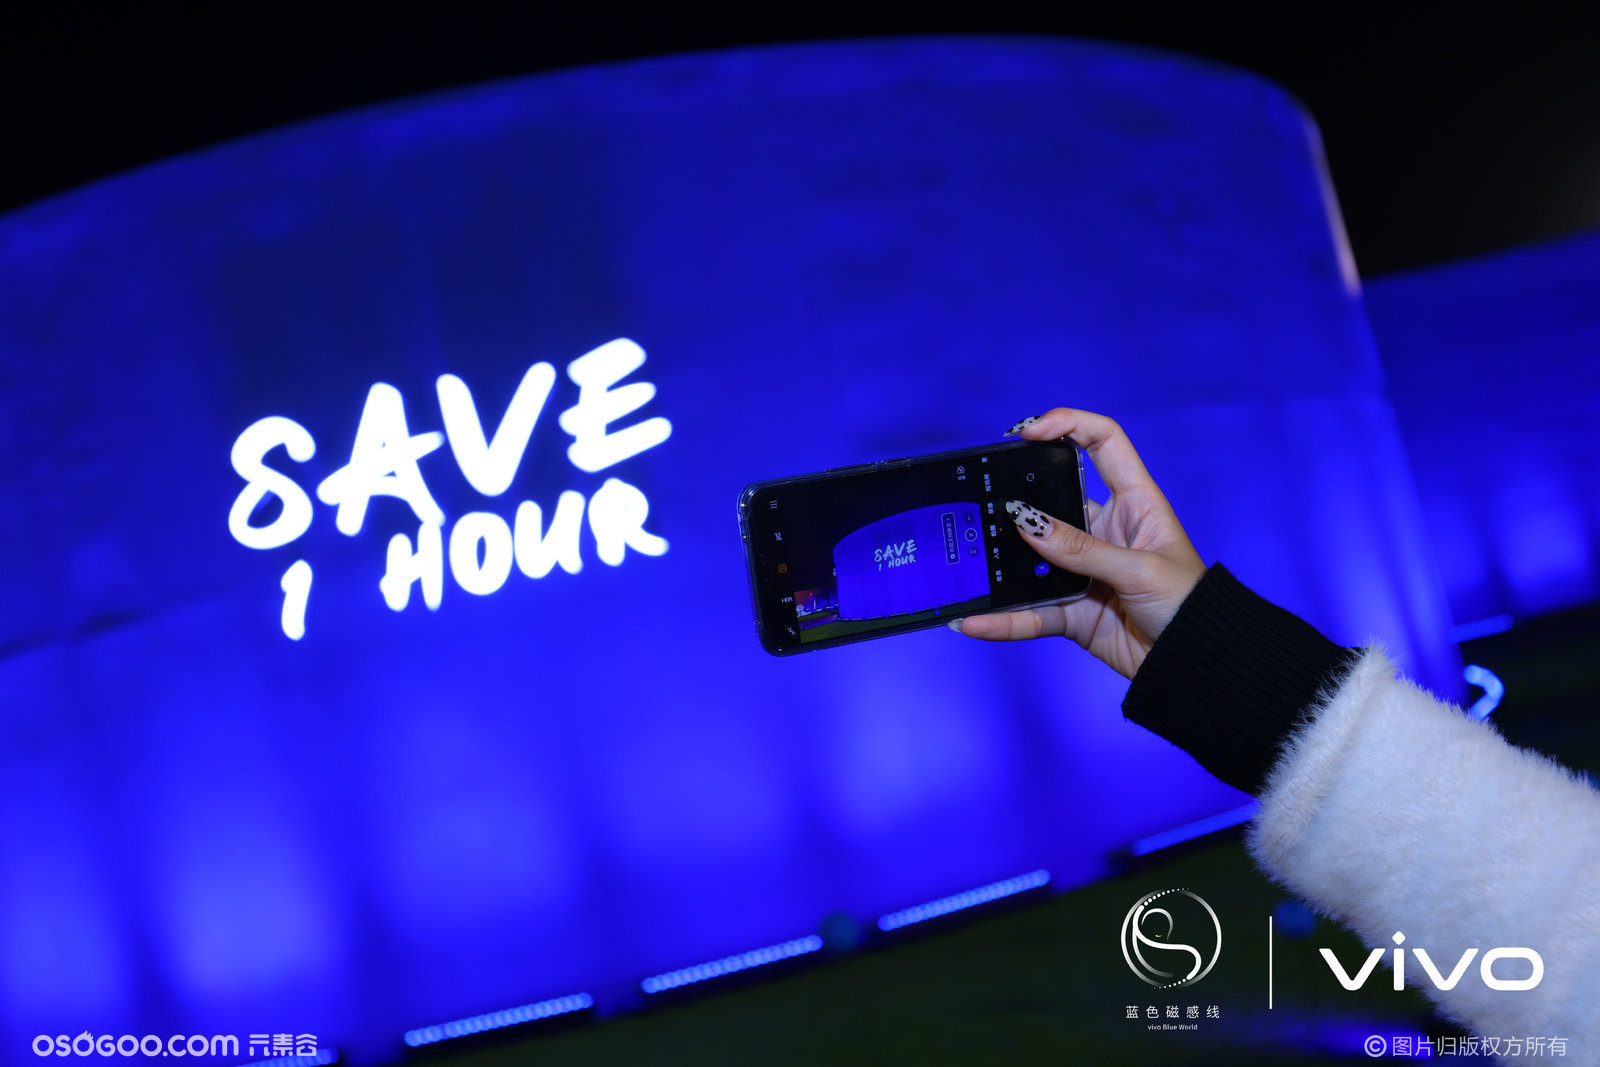 SAVE 1 HOUR·照亮蓝色生命世界 vivo公益活动